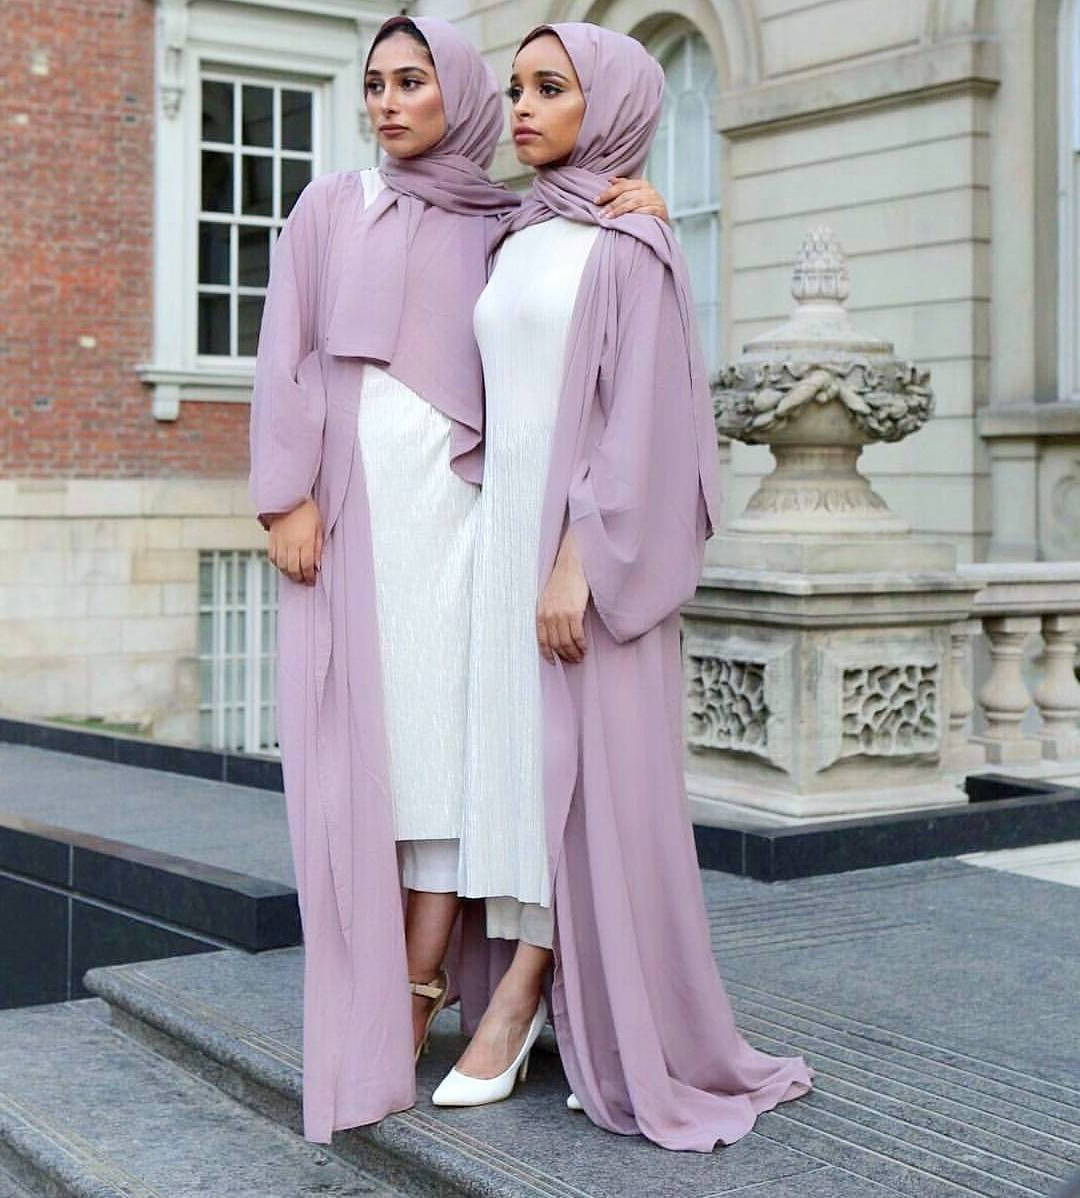 Inspirasi Model Baju Lebaran Tahun 2018 Irdz 50 Model Baju Lebaran Terbaru 2018 Modern & Elegan